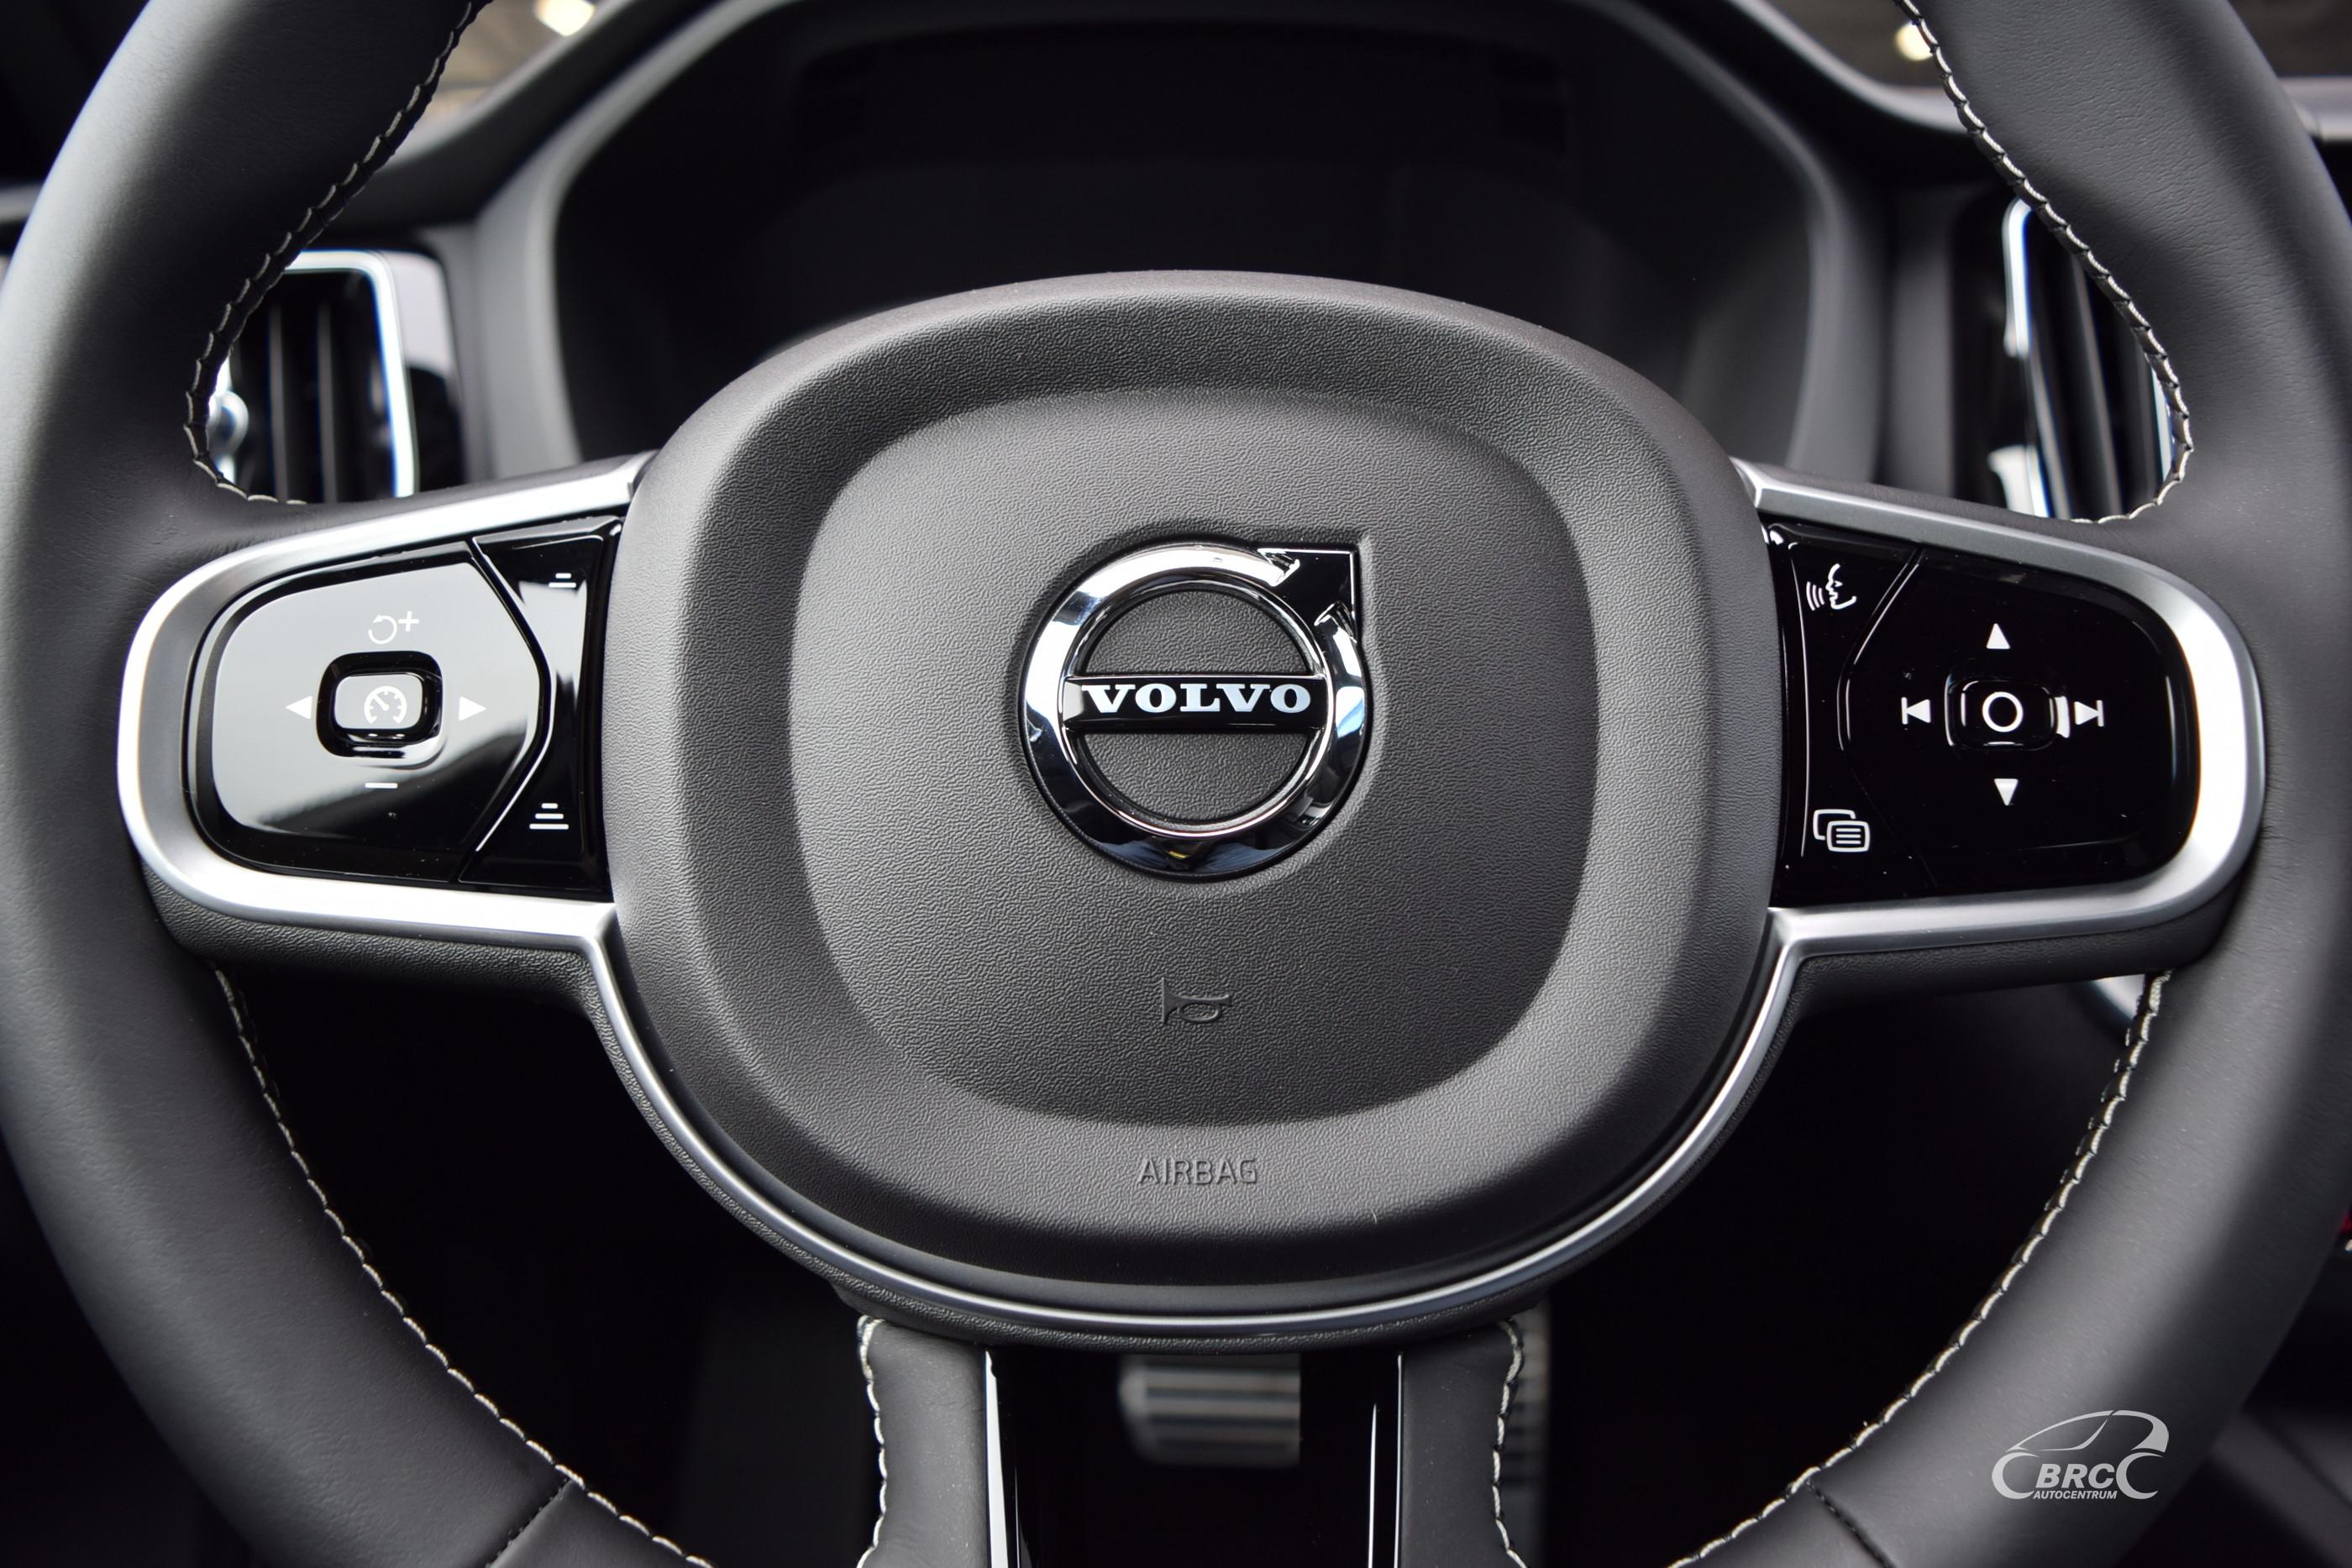 Volvo XC 60 B5 R-Design AWD Mild-Hybrid